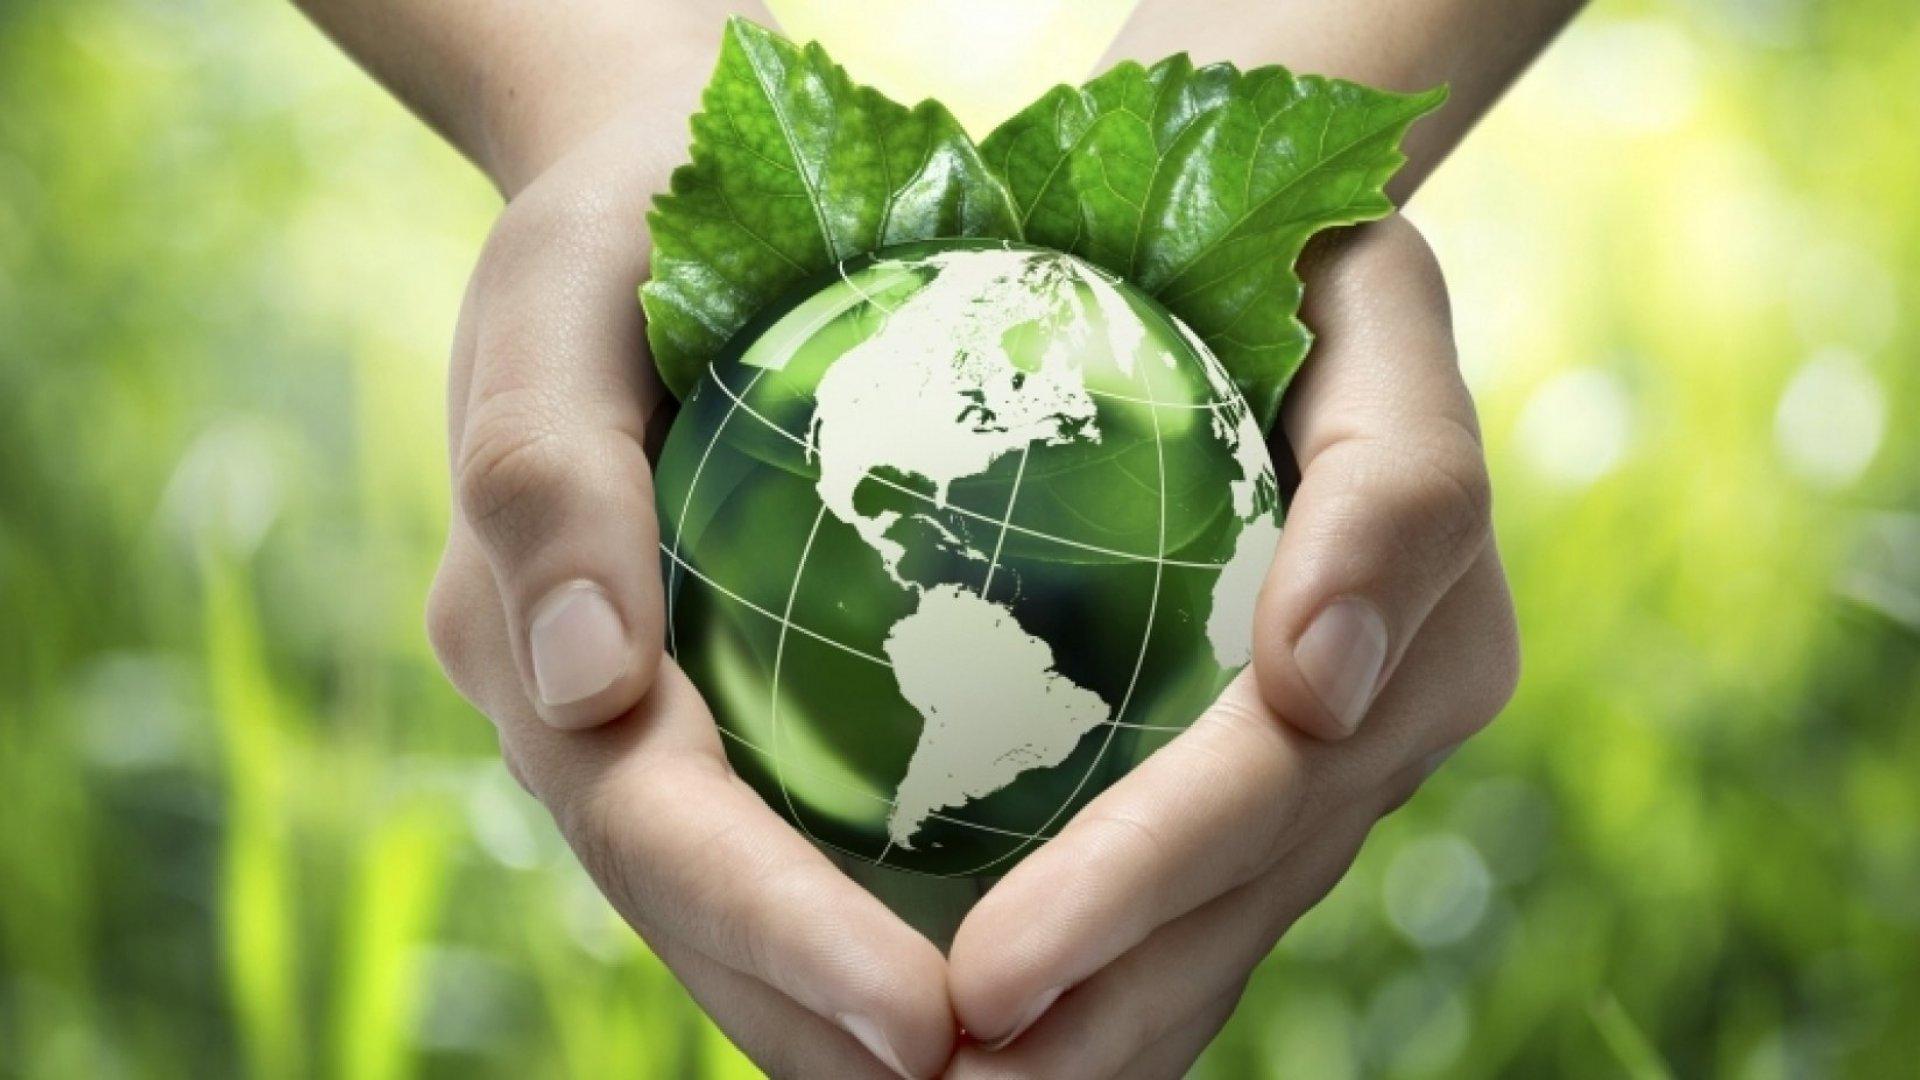 The Eco-Challenge